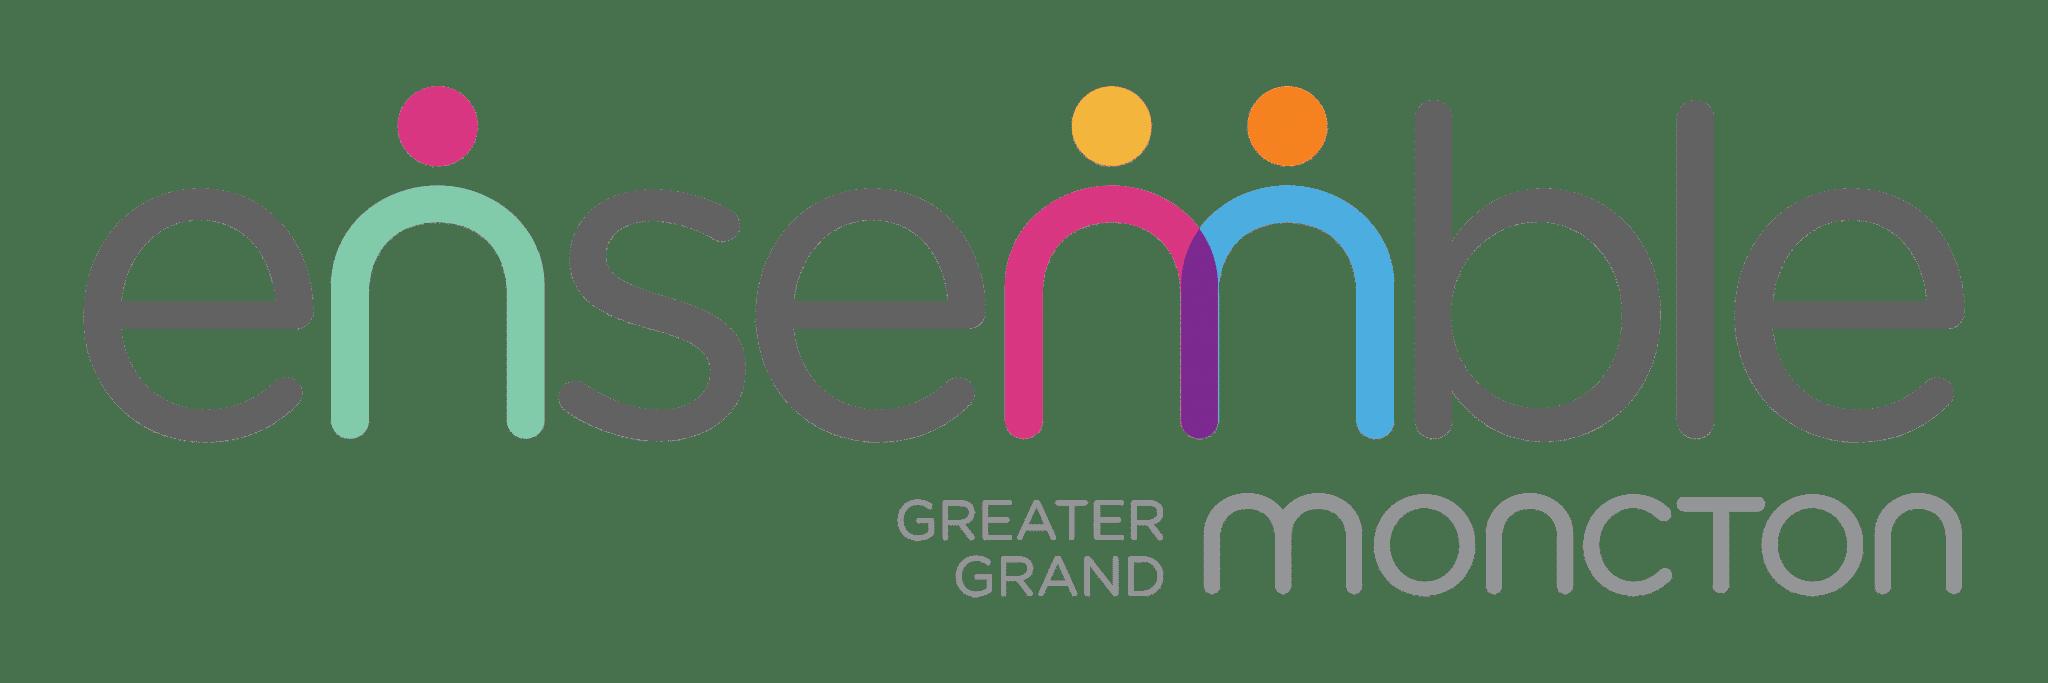 ENSEMBLE Services Greater-Grand Moncton logo